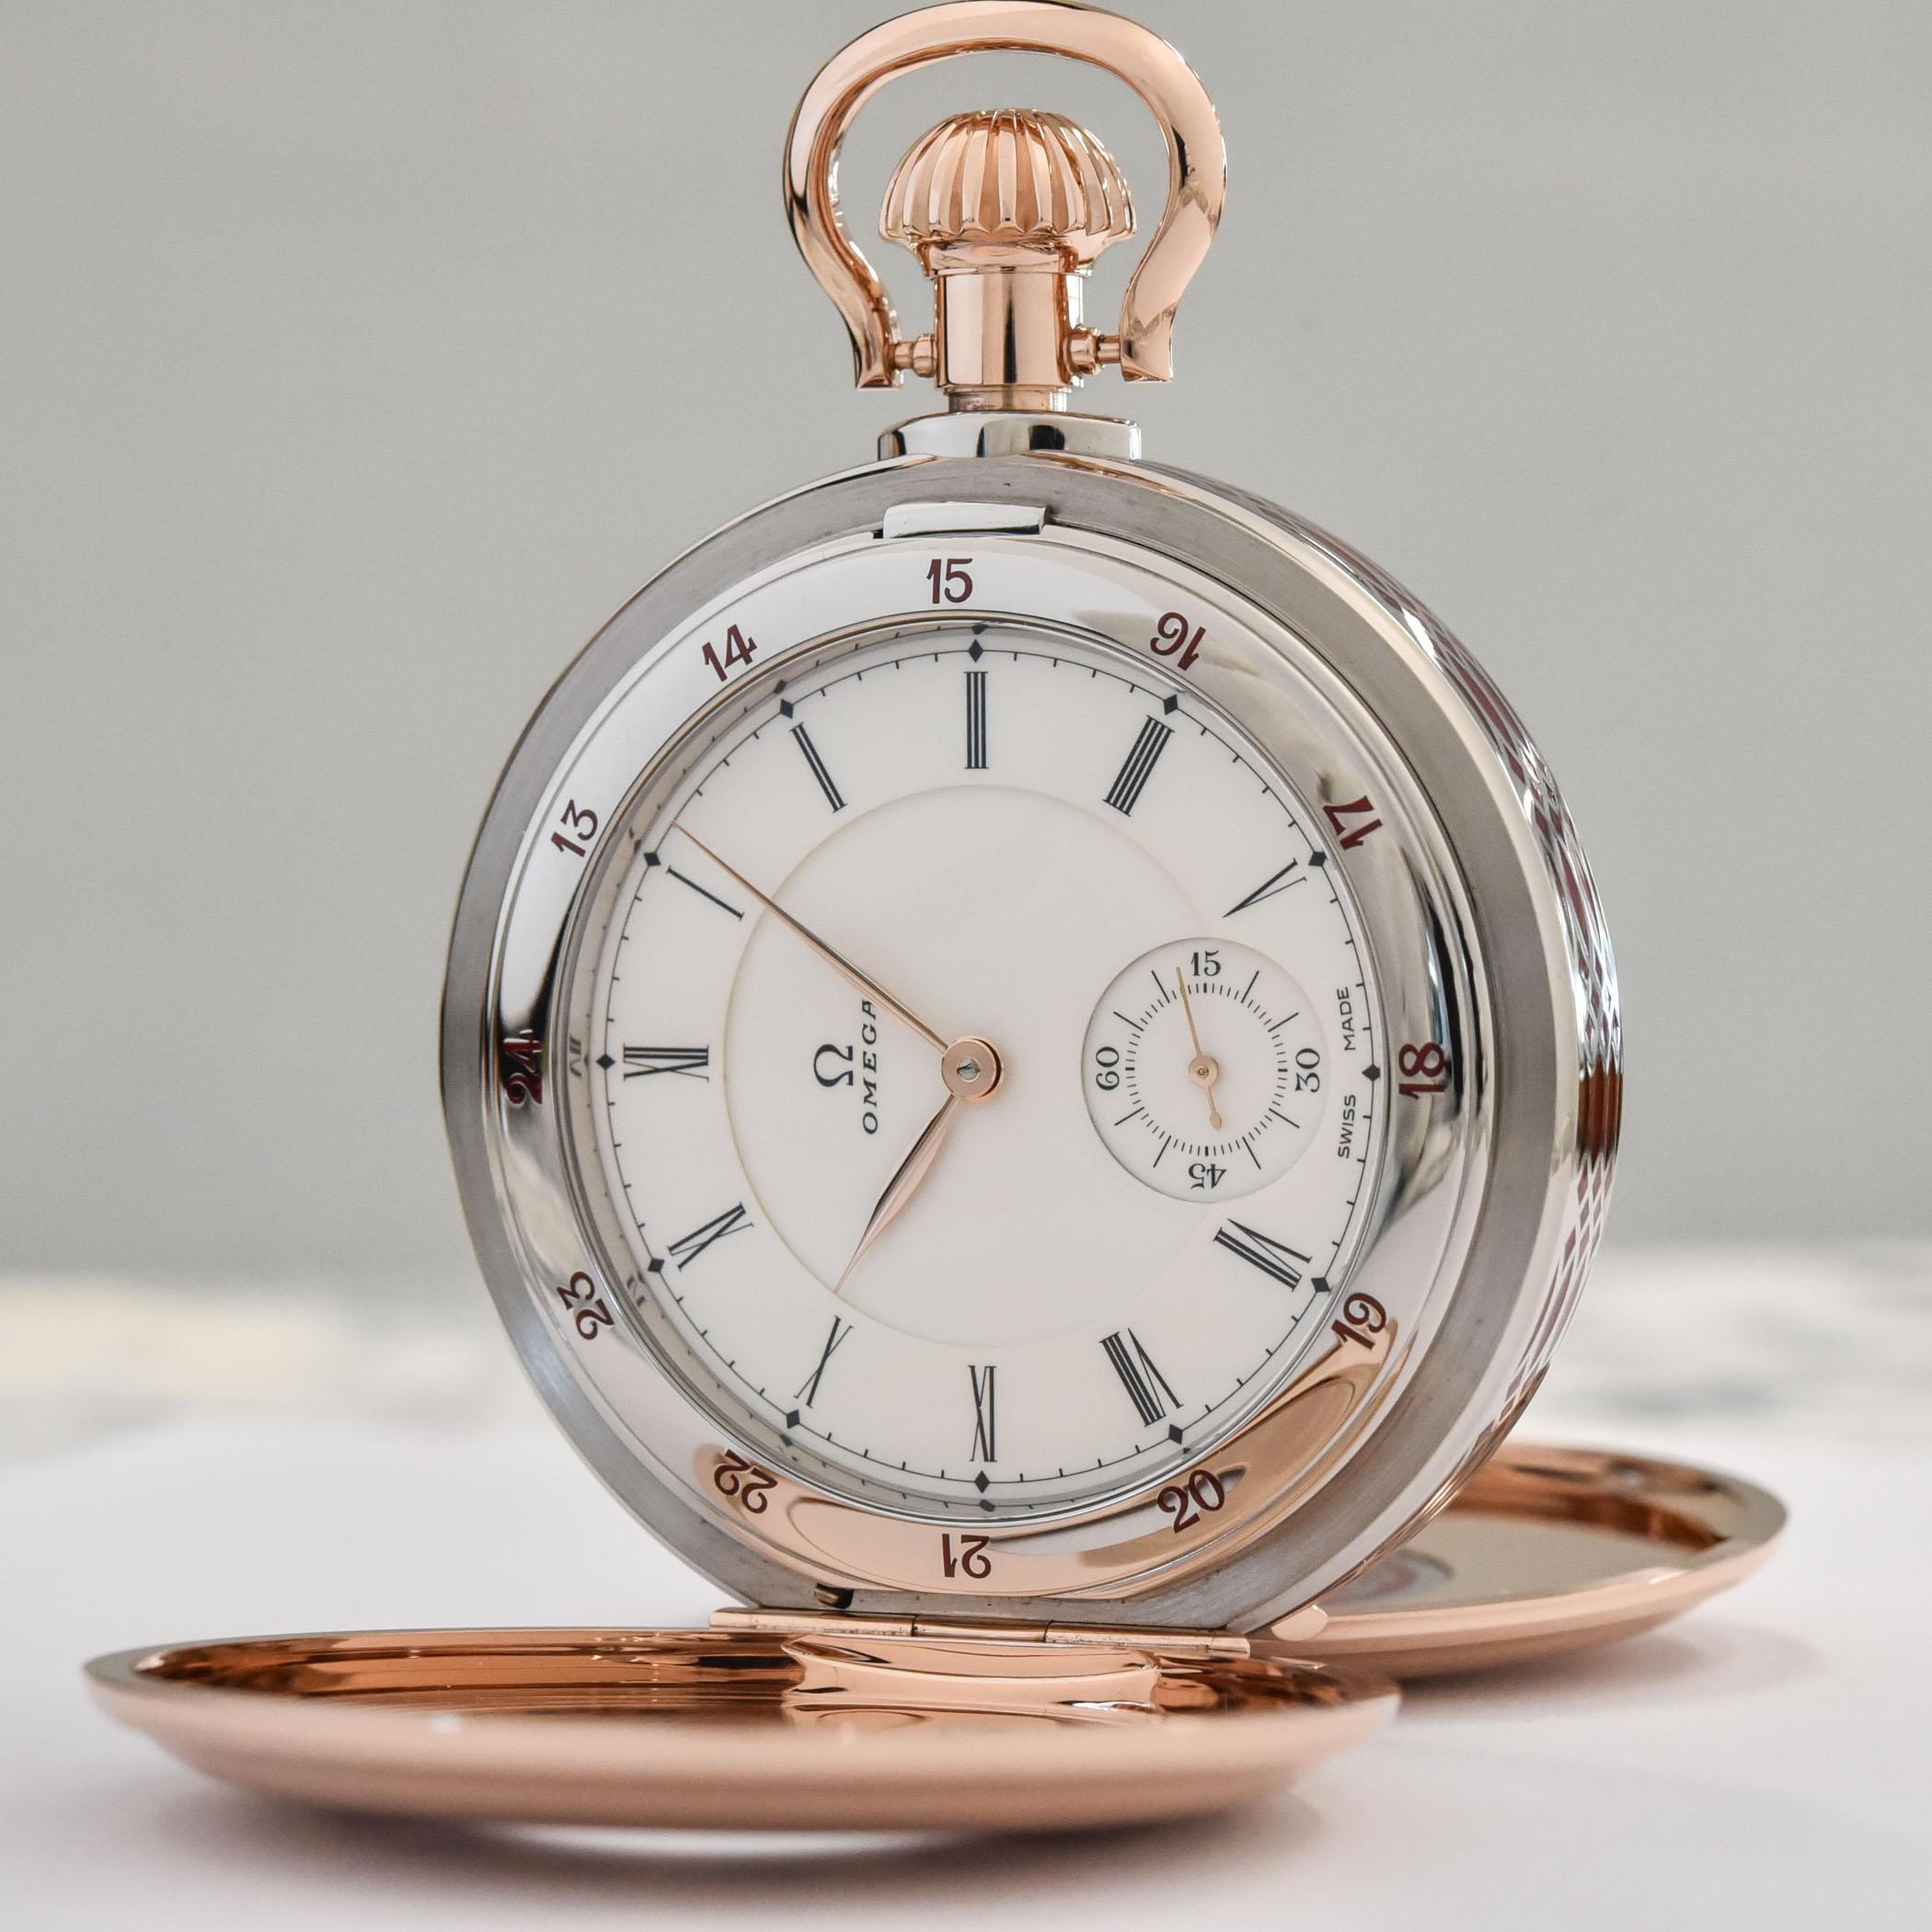 Omega 125th Anniversary Pocket Watch 19-Ligne Calibre 518.62.60.00.04.001